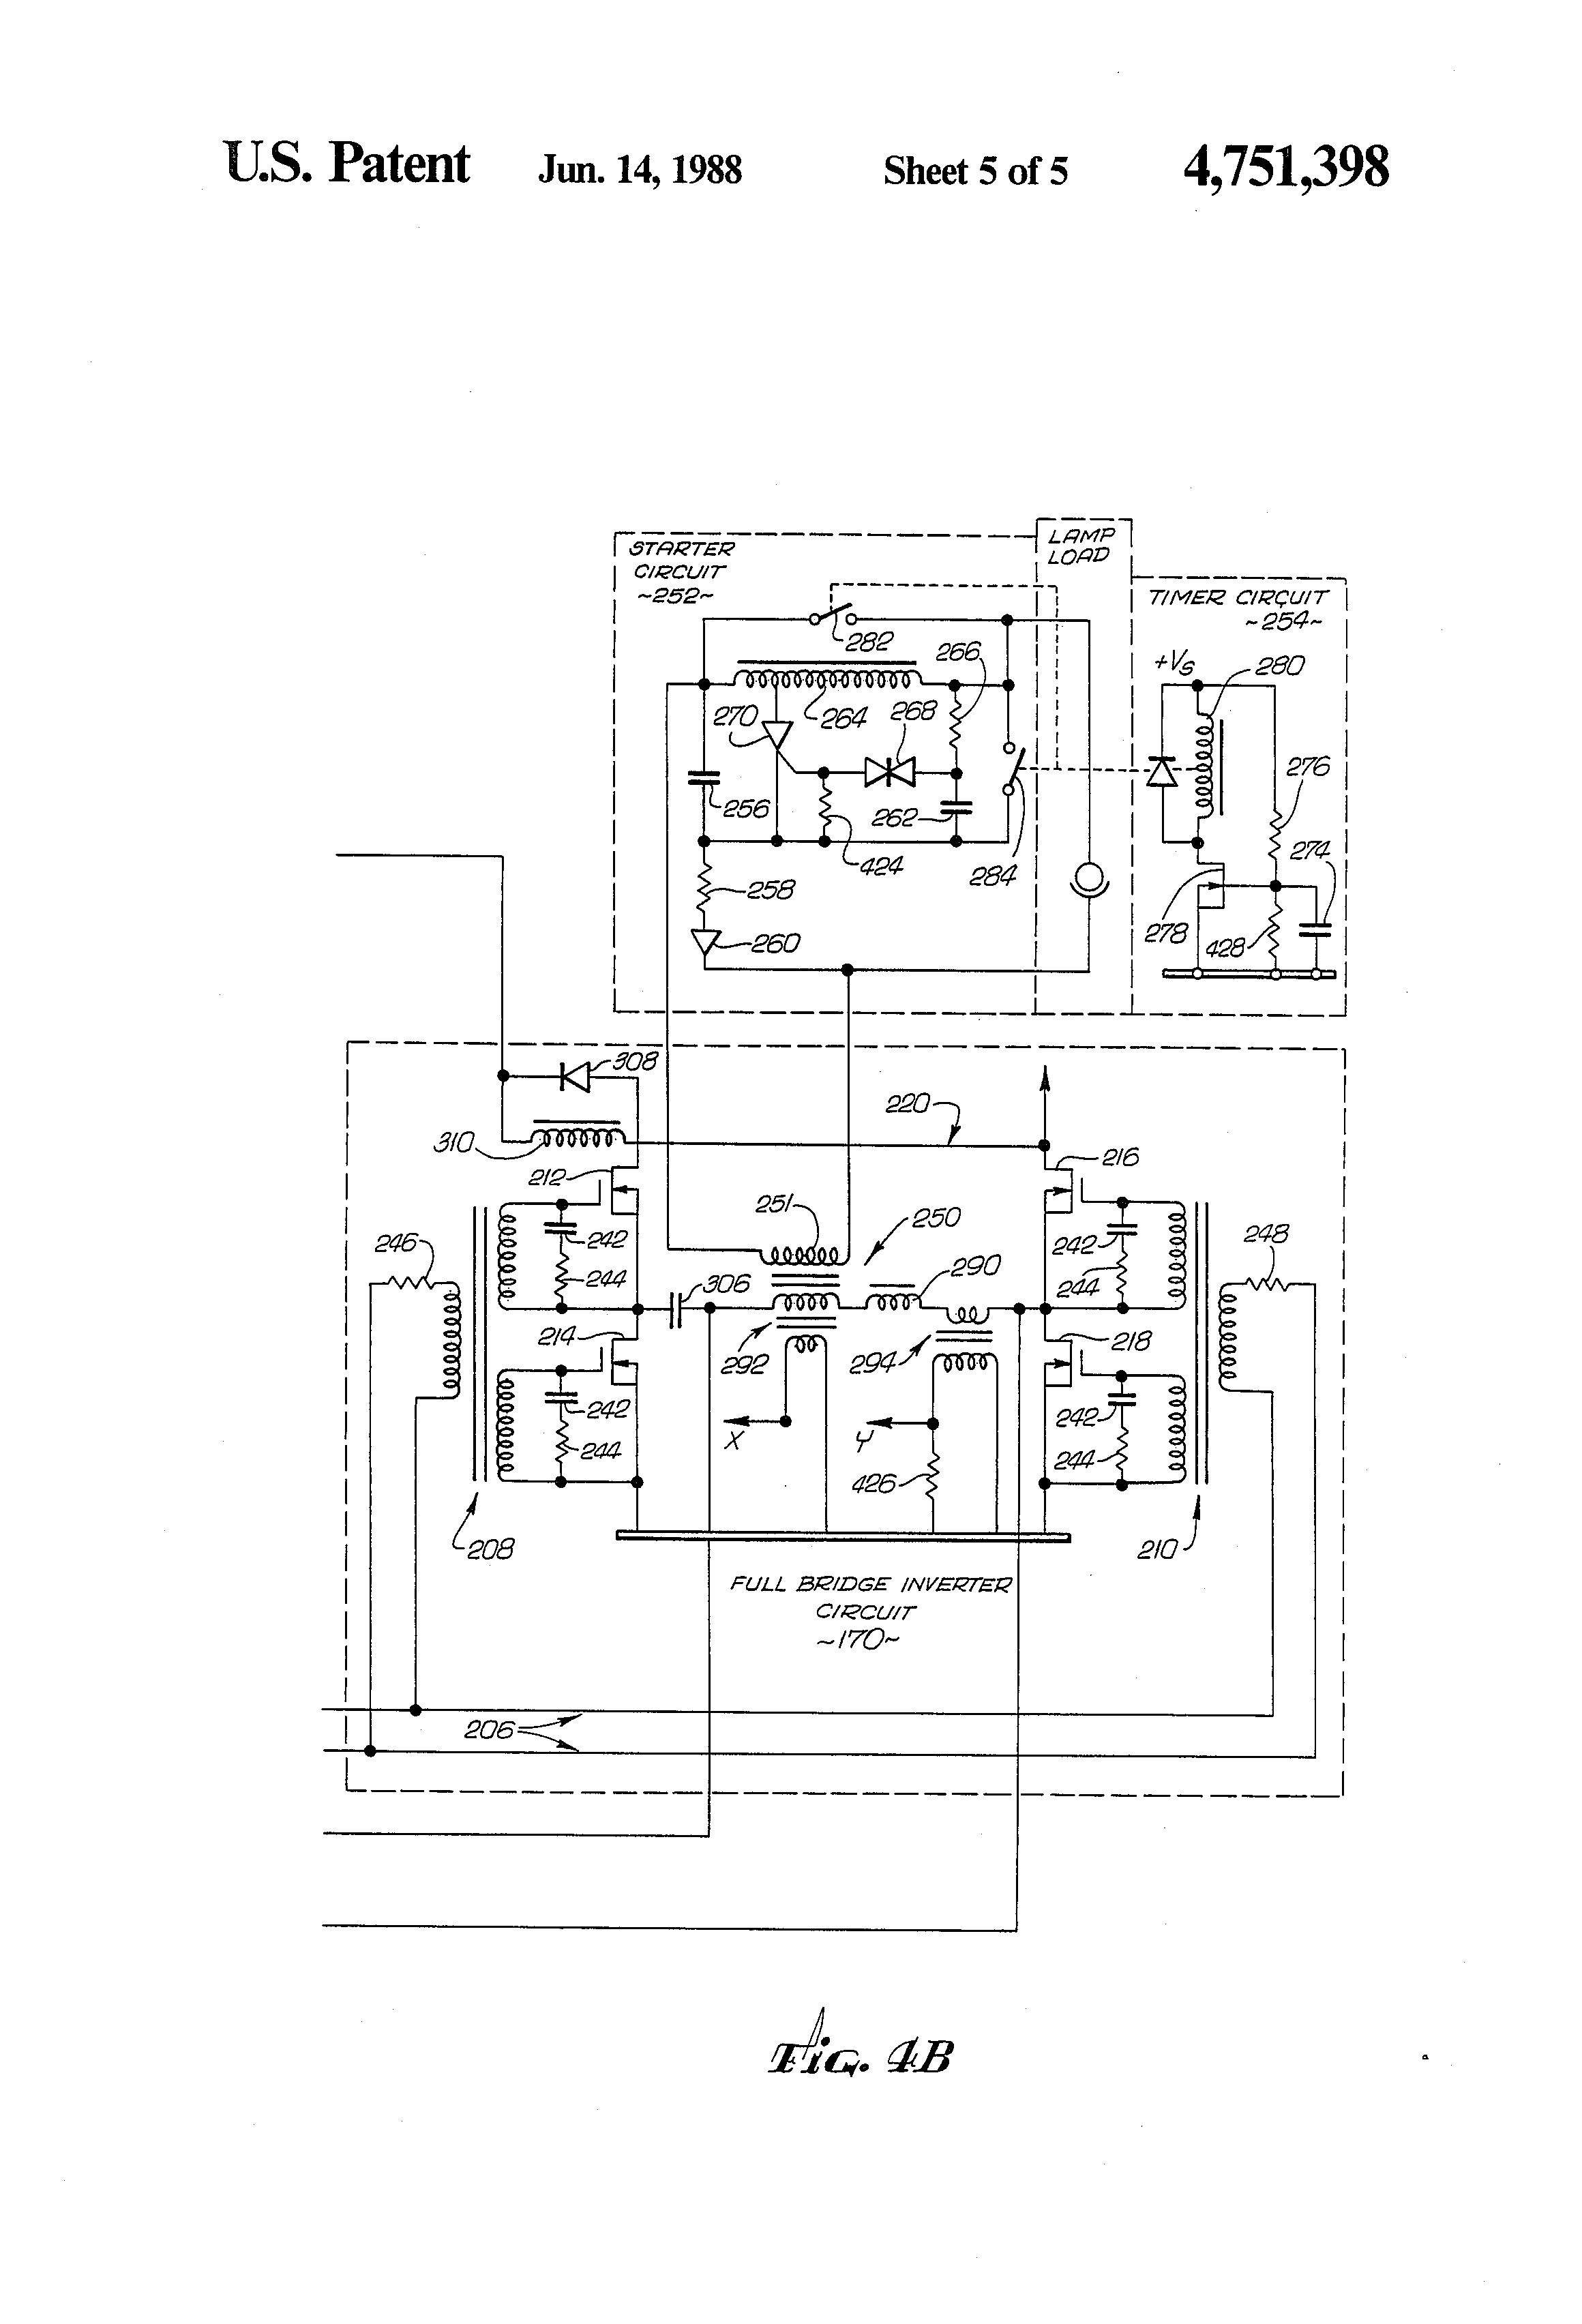 High Pressure Sodium Light Wiring Diagram from detoxicrecenze.com